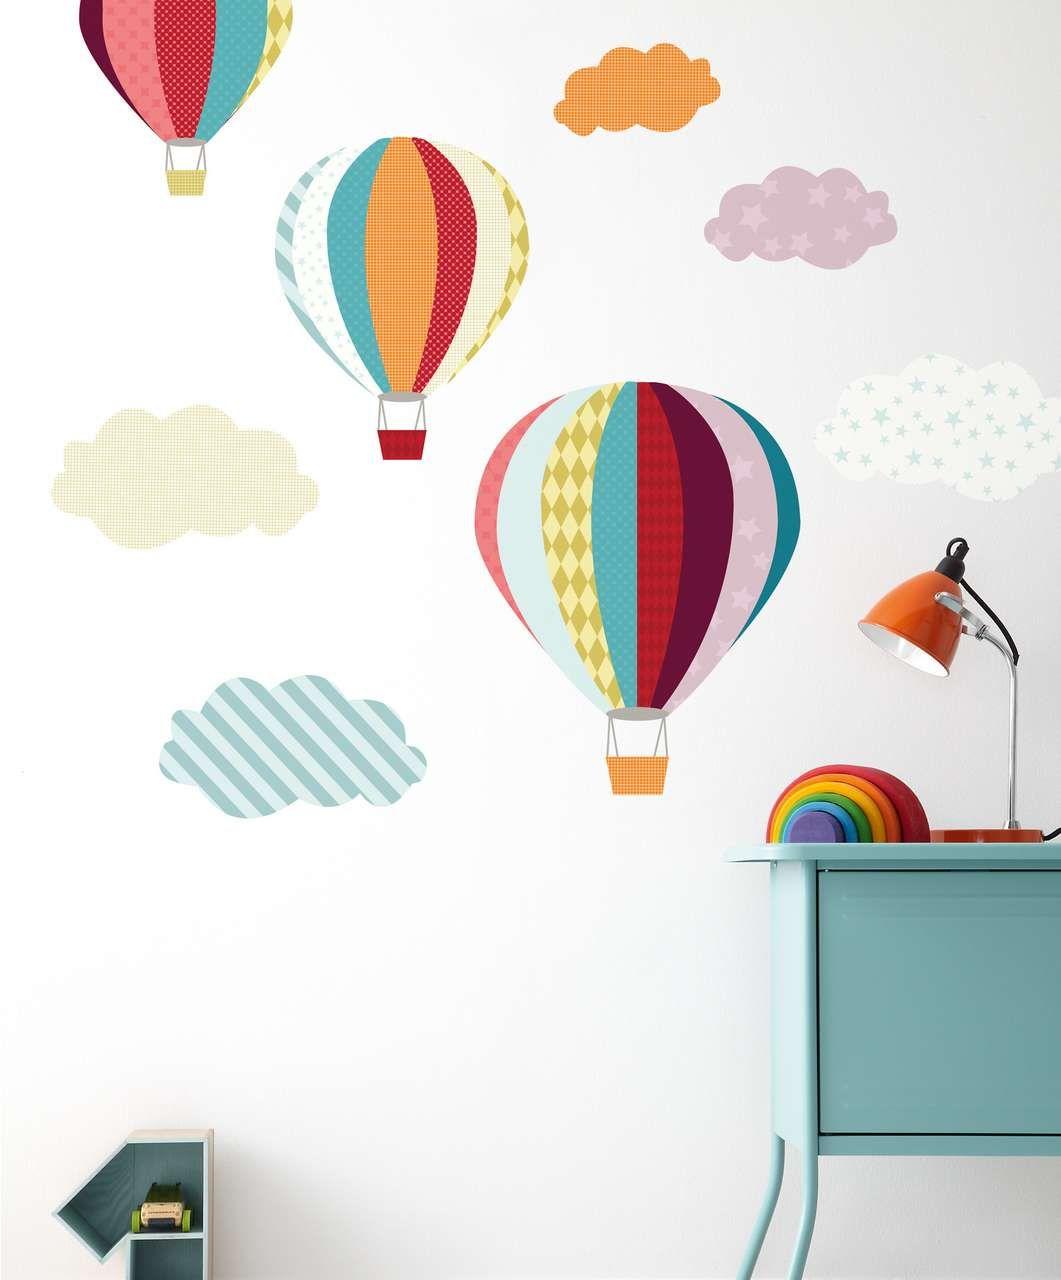 Patternology  Balloons Wall Stickers  Patternology  Mamas & Papas